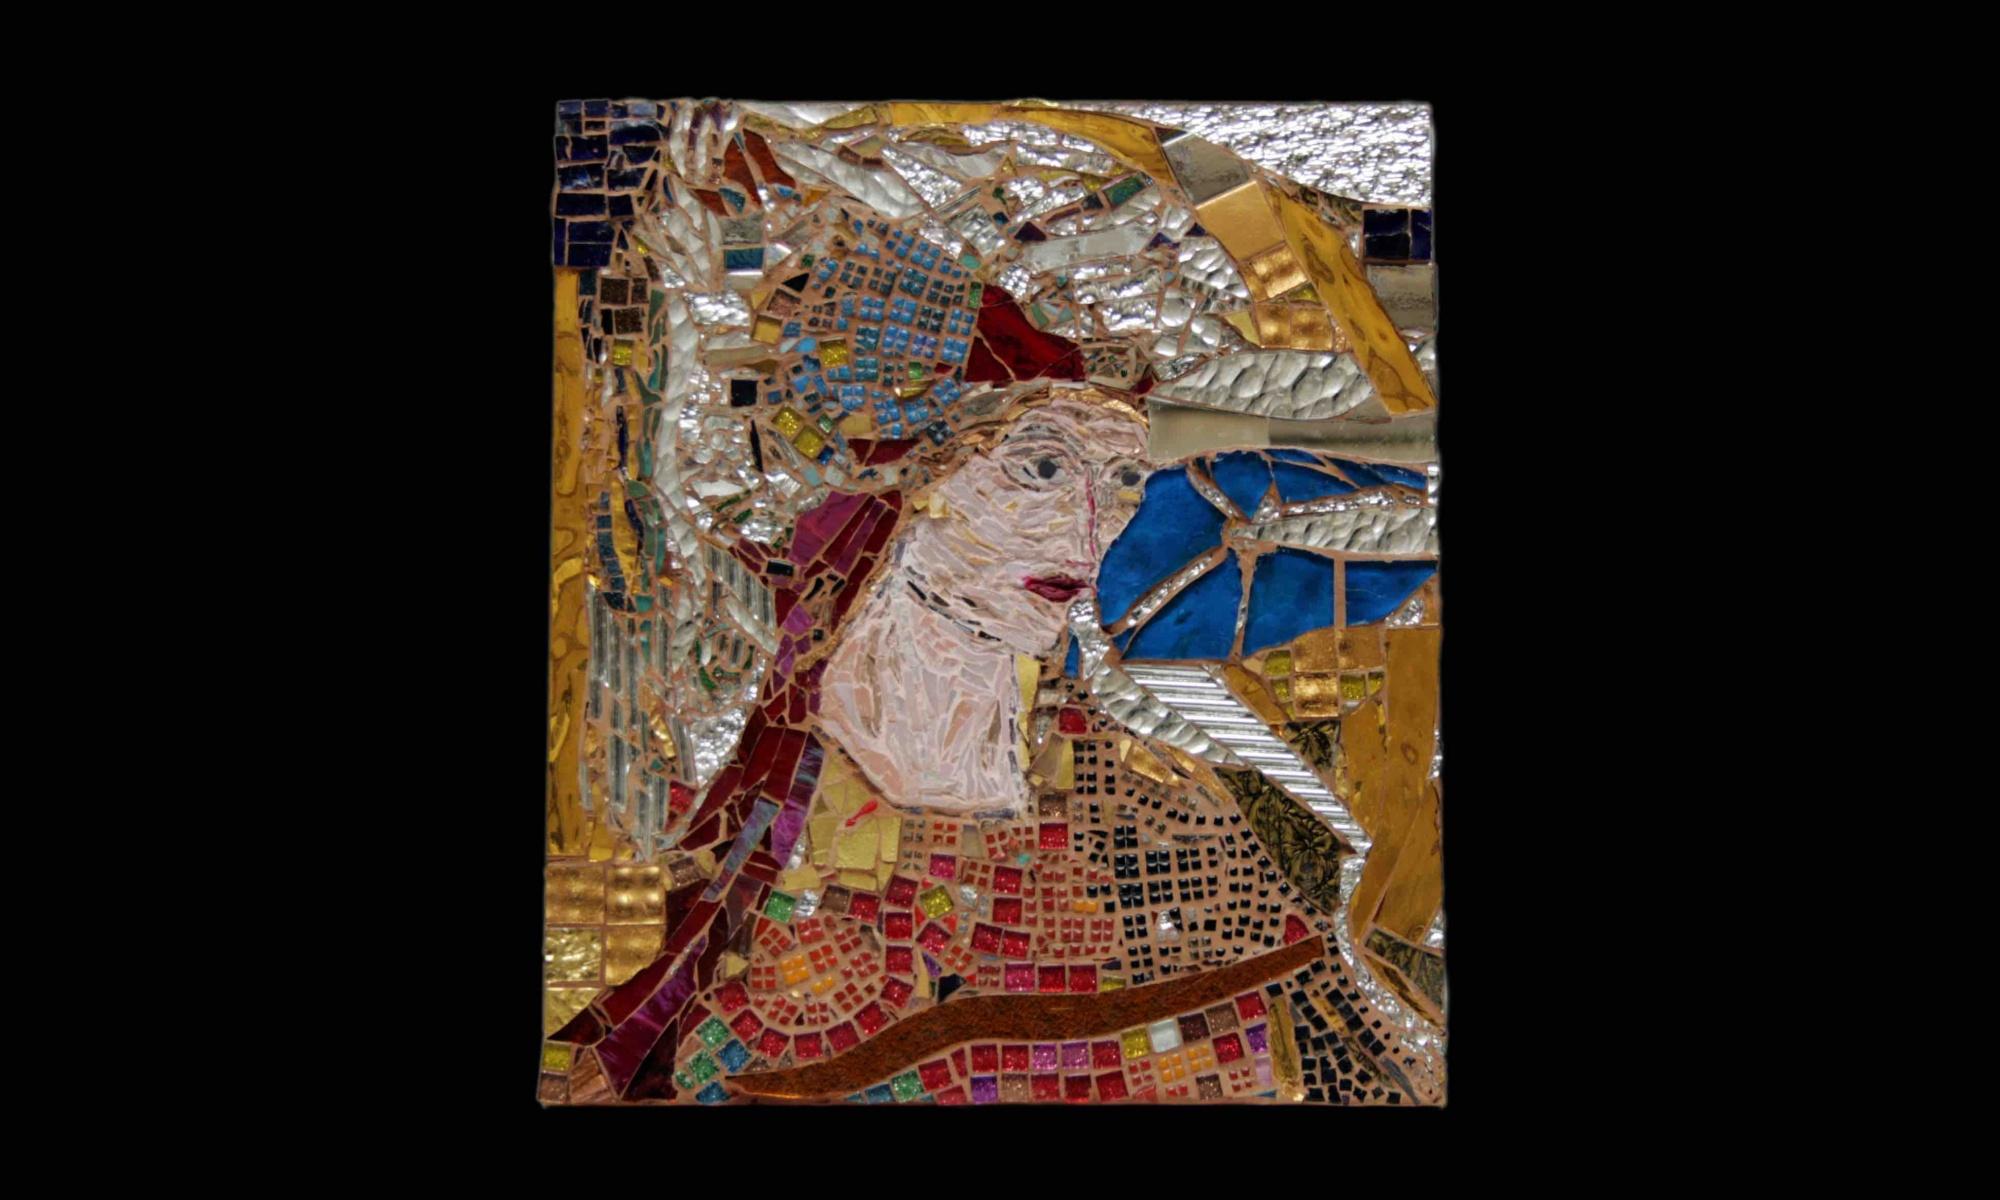 Laëtitia-Ambroselli-2008-Conscience